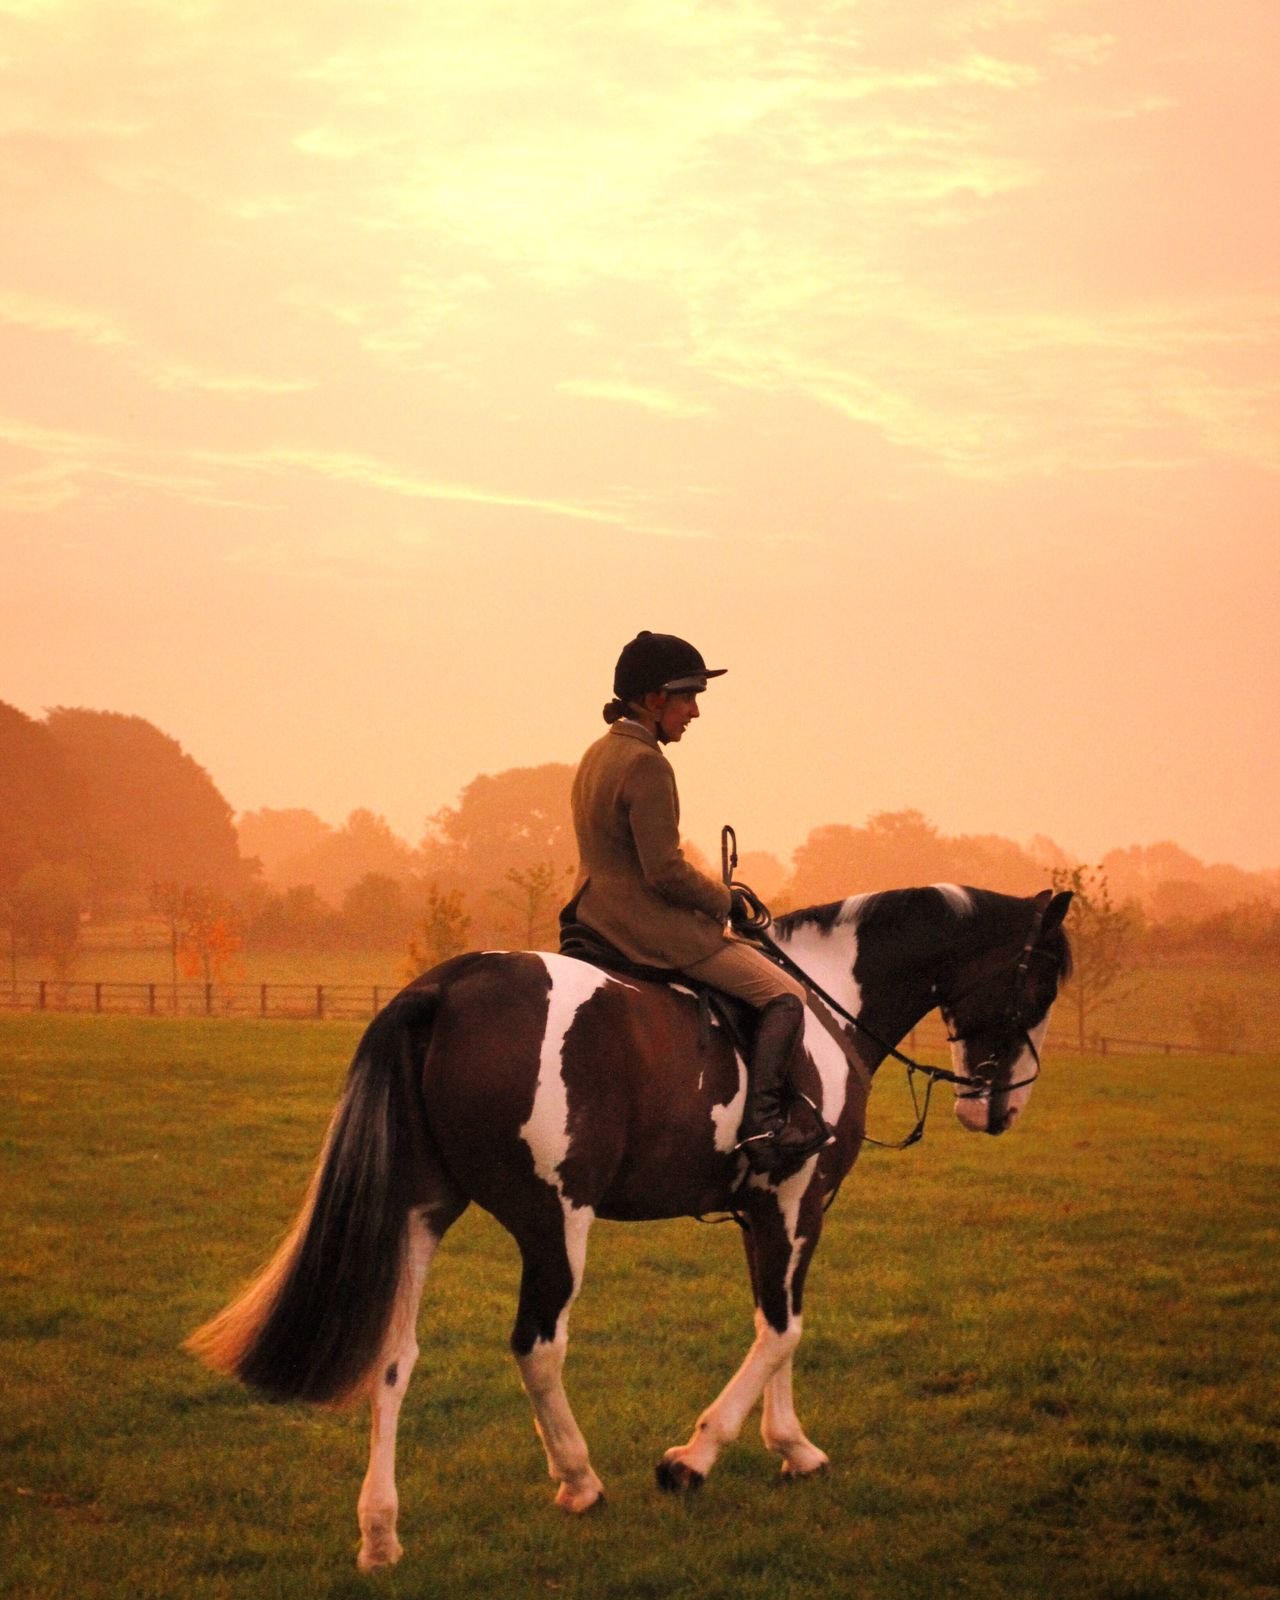 Beautiful stock photos of jagd, horse, horseback riding, riding, domestic animals